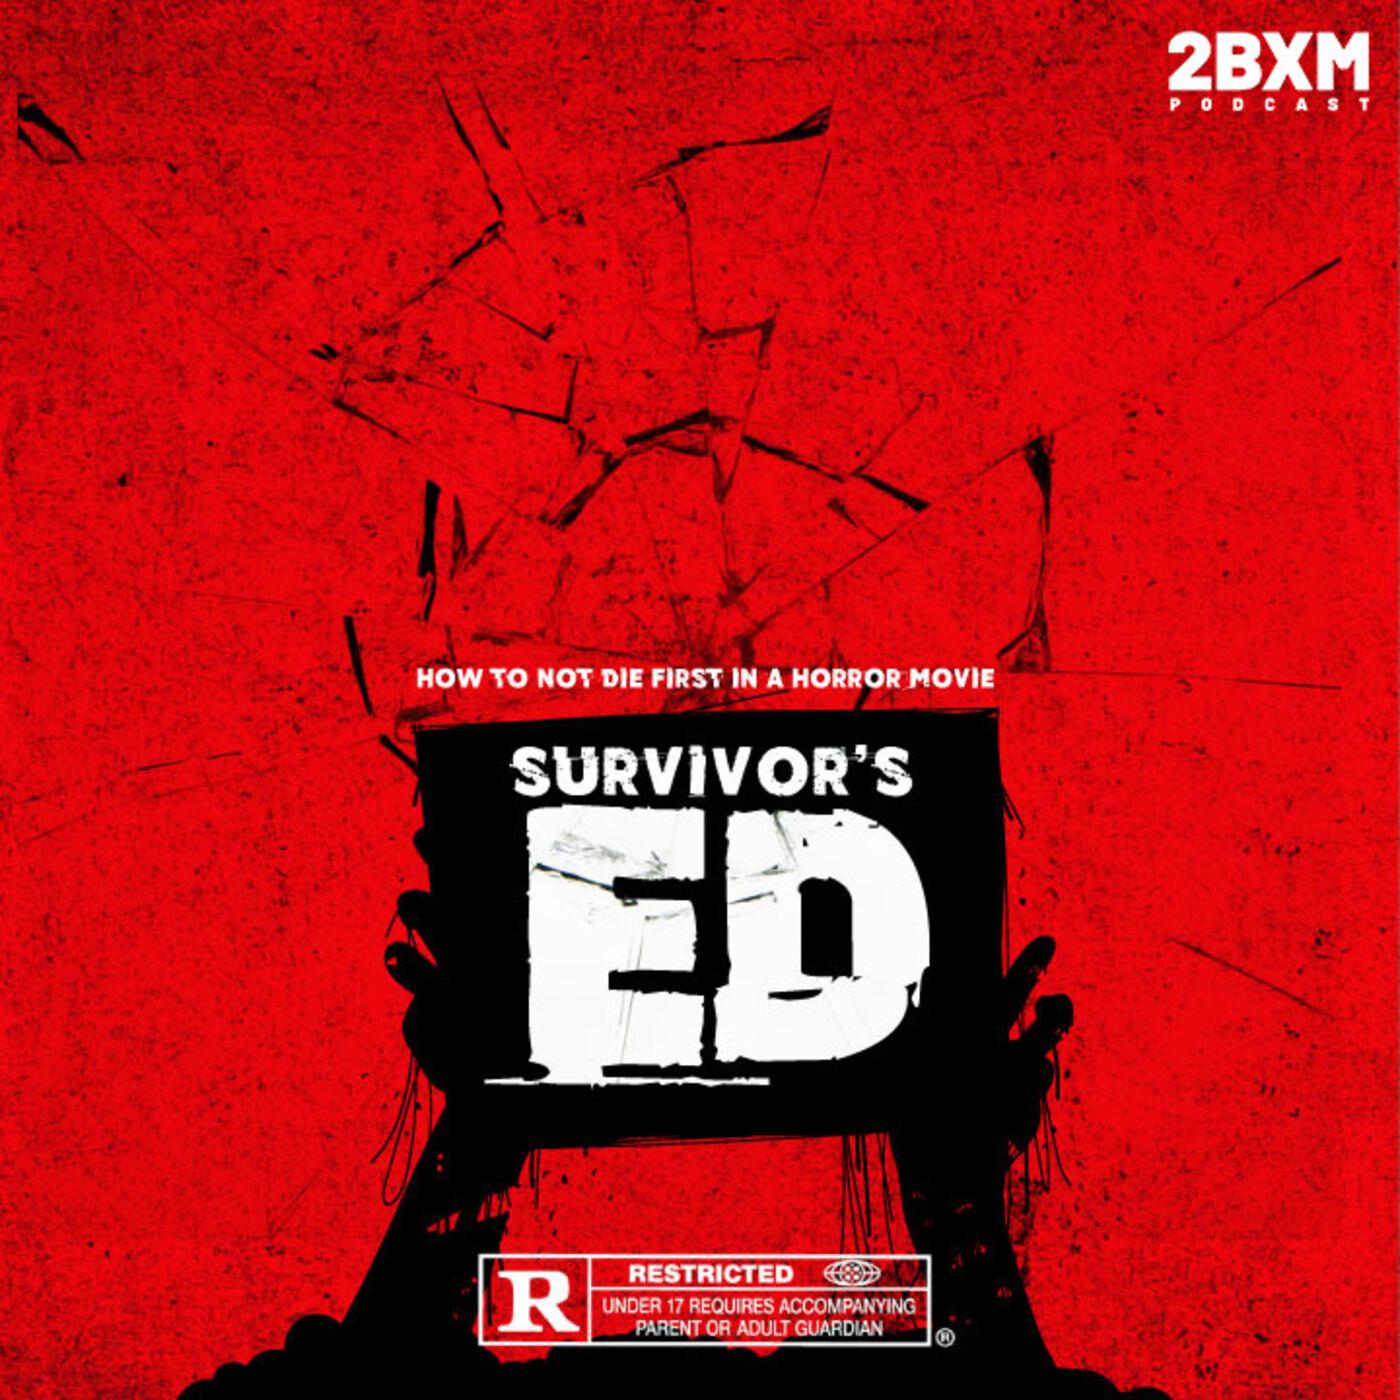 Survivor's Ed